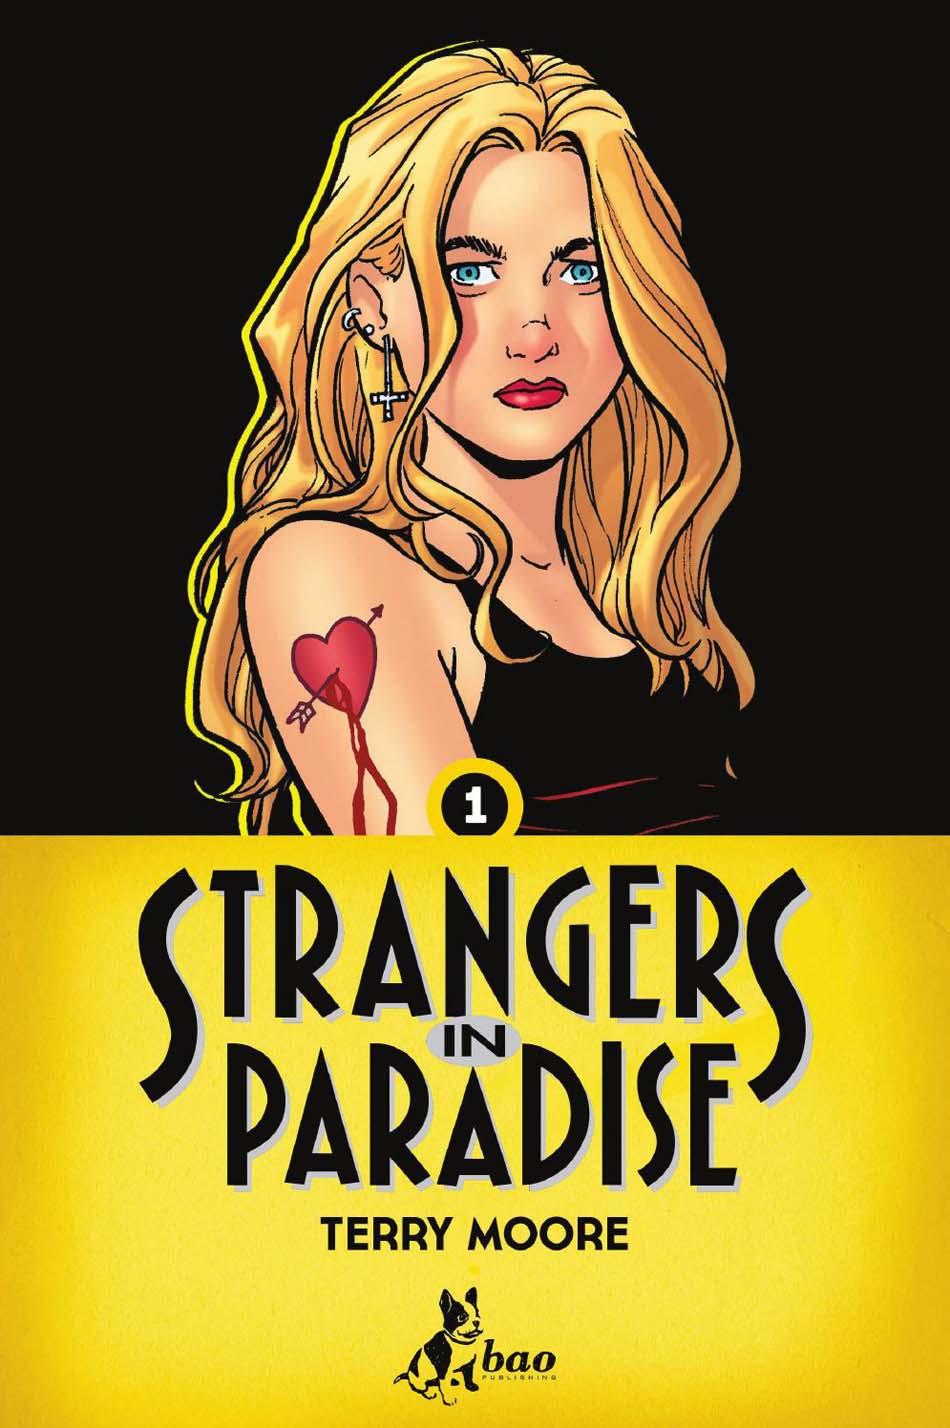 Strangers in Paradise_1_cover volume 1